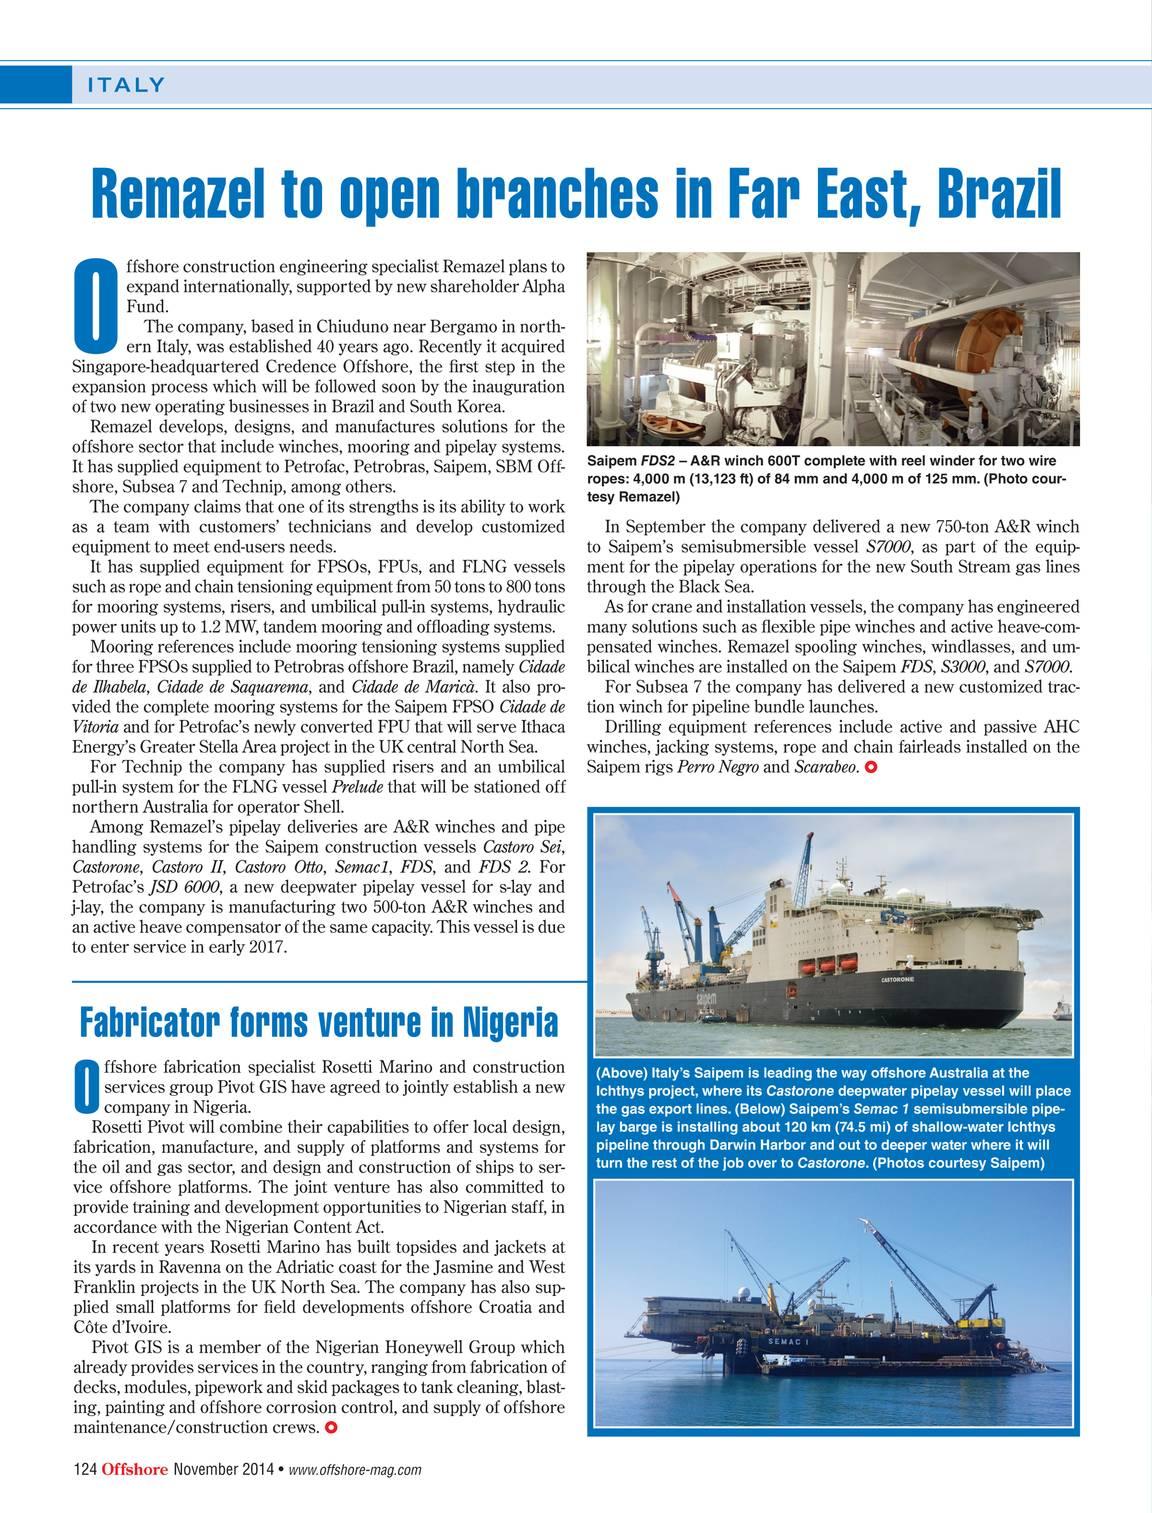 Offshore Magazine - November 2014 - page 123